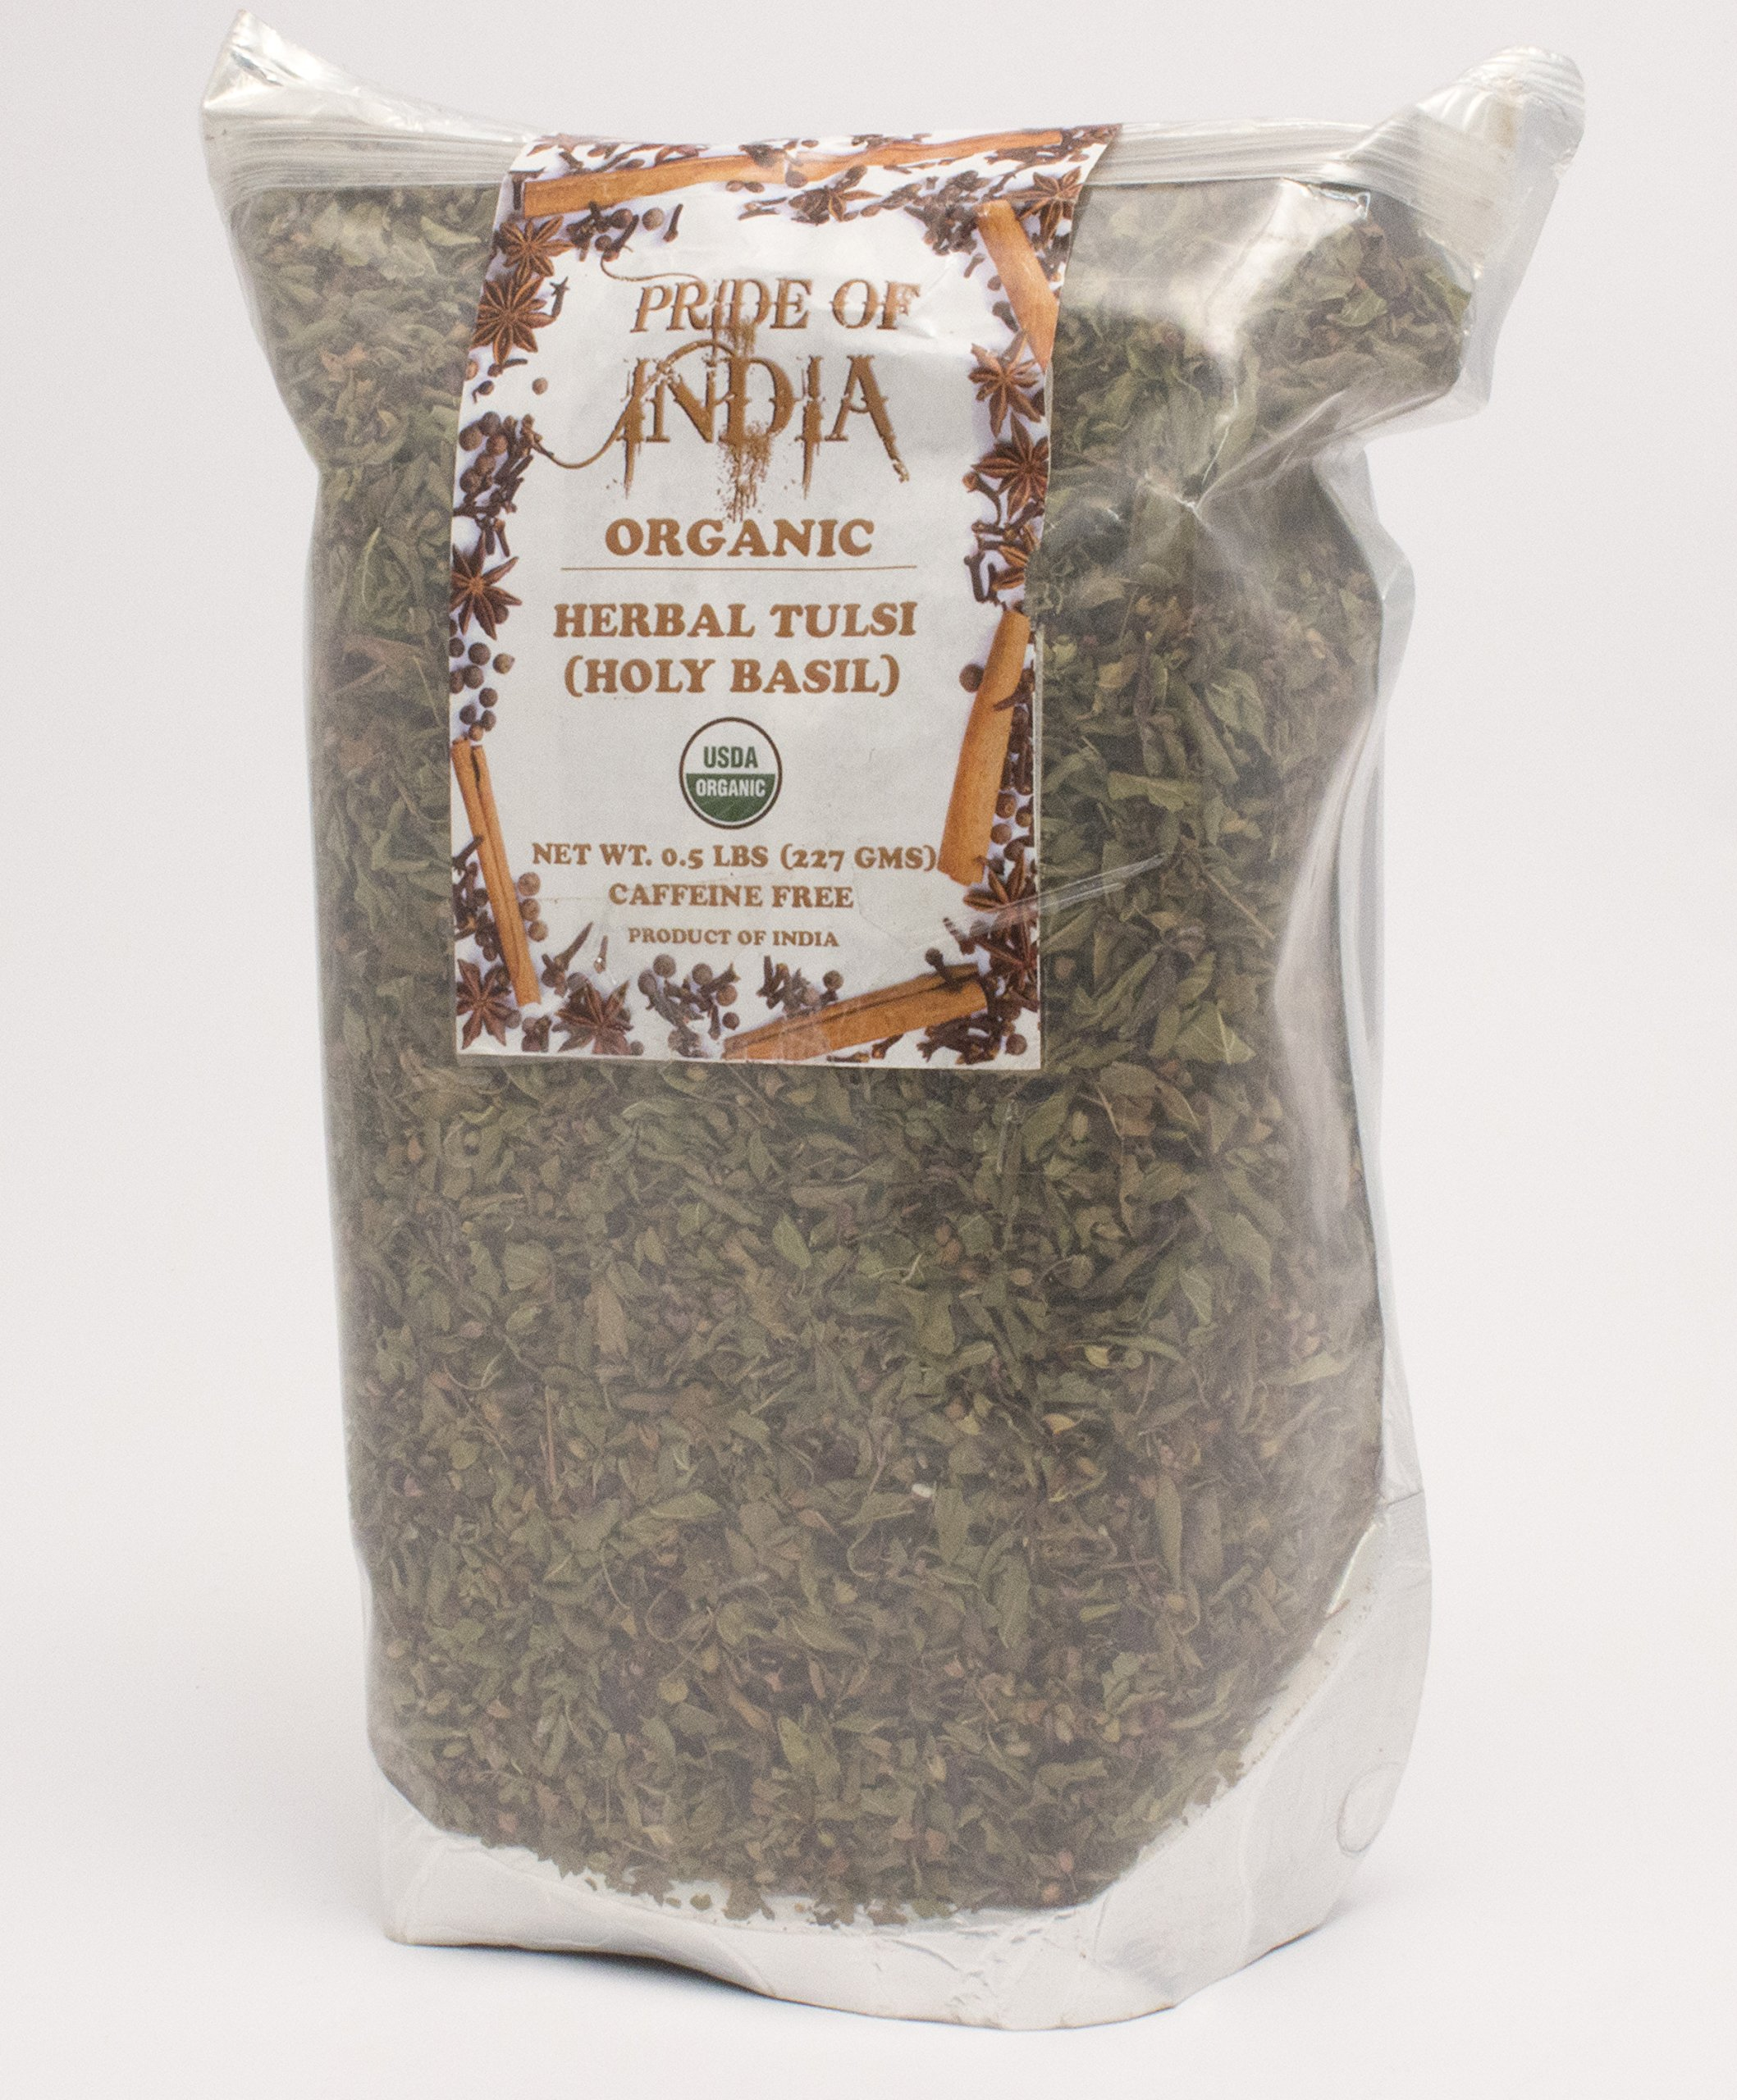 Pride Of India - Organic Tulsi Holy-Basil Herbal Tea, 3.53 oz (100gm) Whole Leaf